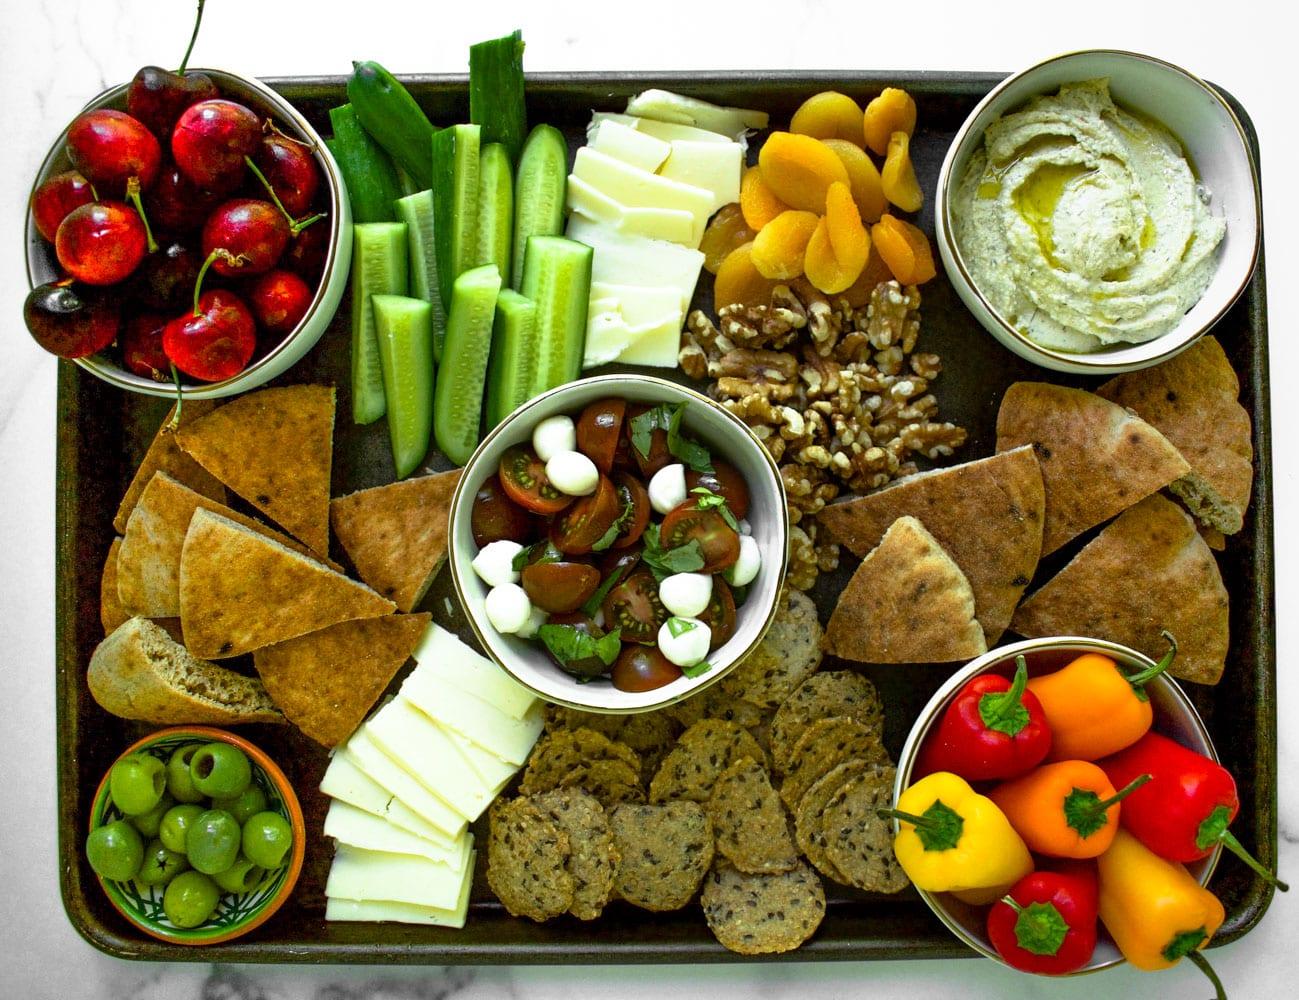 Sheet Pan Mediterranean Mezze Platter Vegetarian Sarah Gold Nutrition